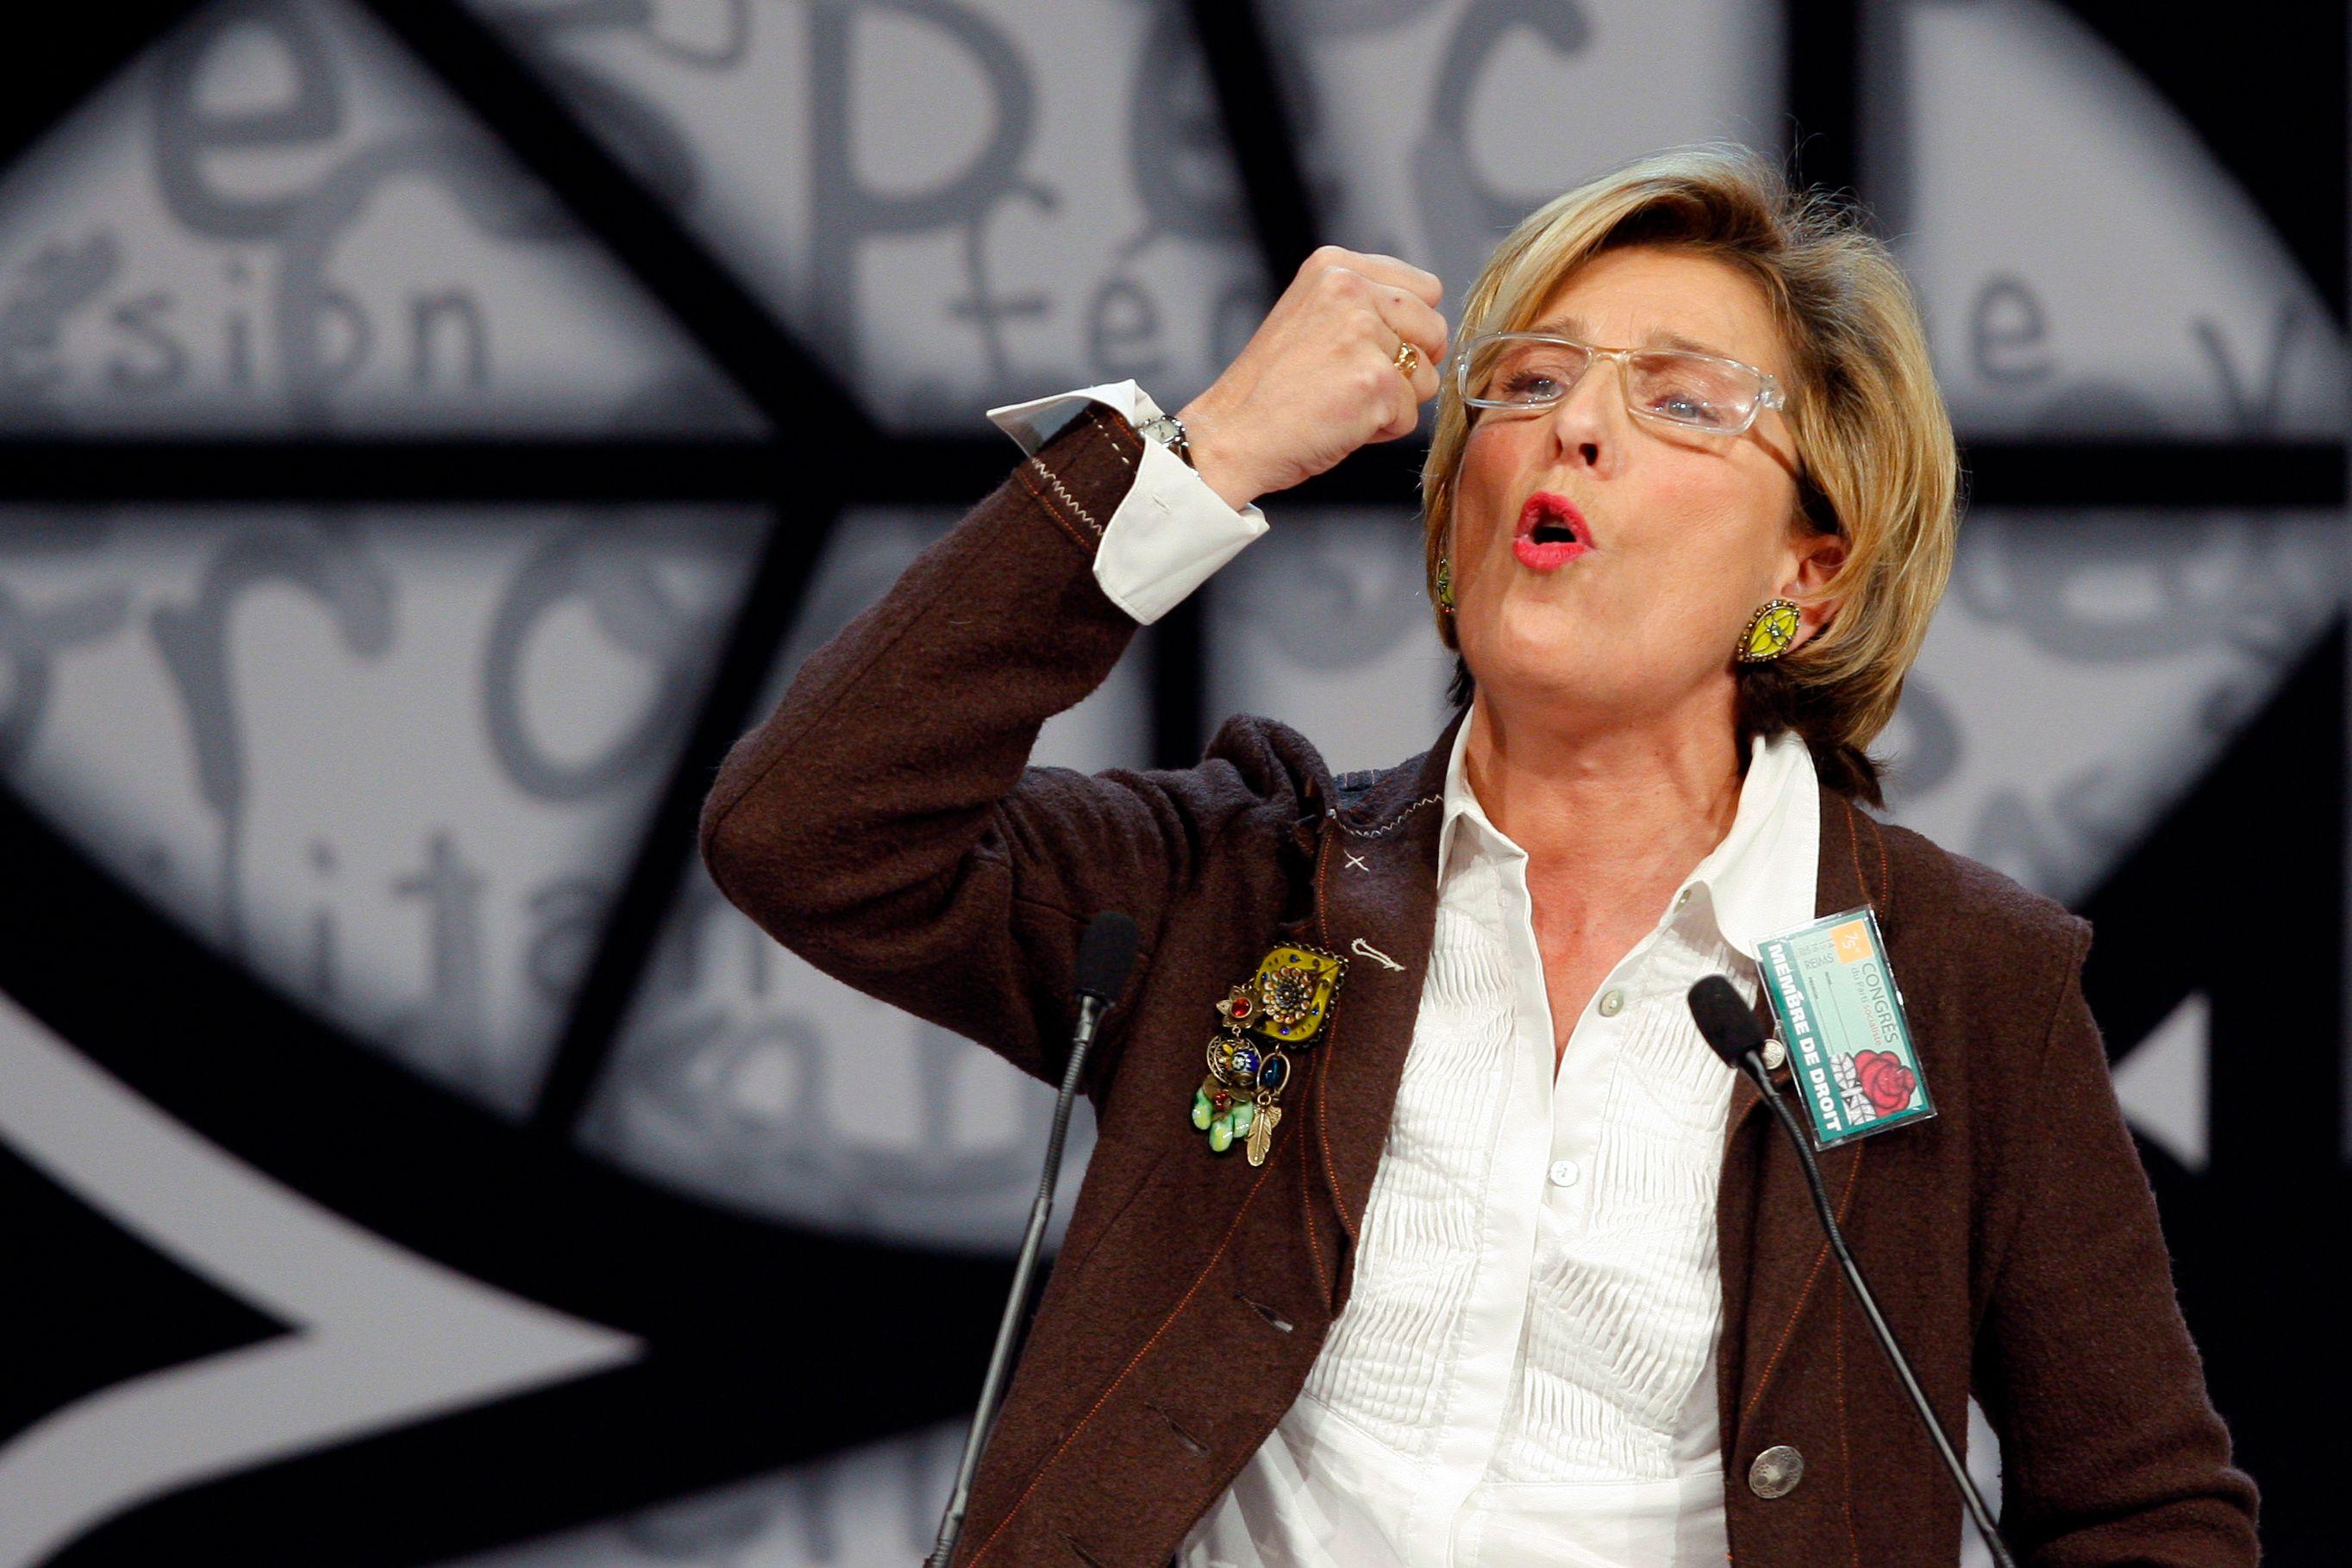 Marie-Noëlle Lienemann a fait savoir son désaccord avec Hollande